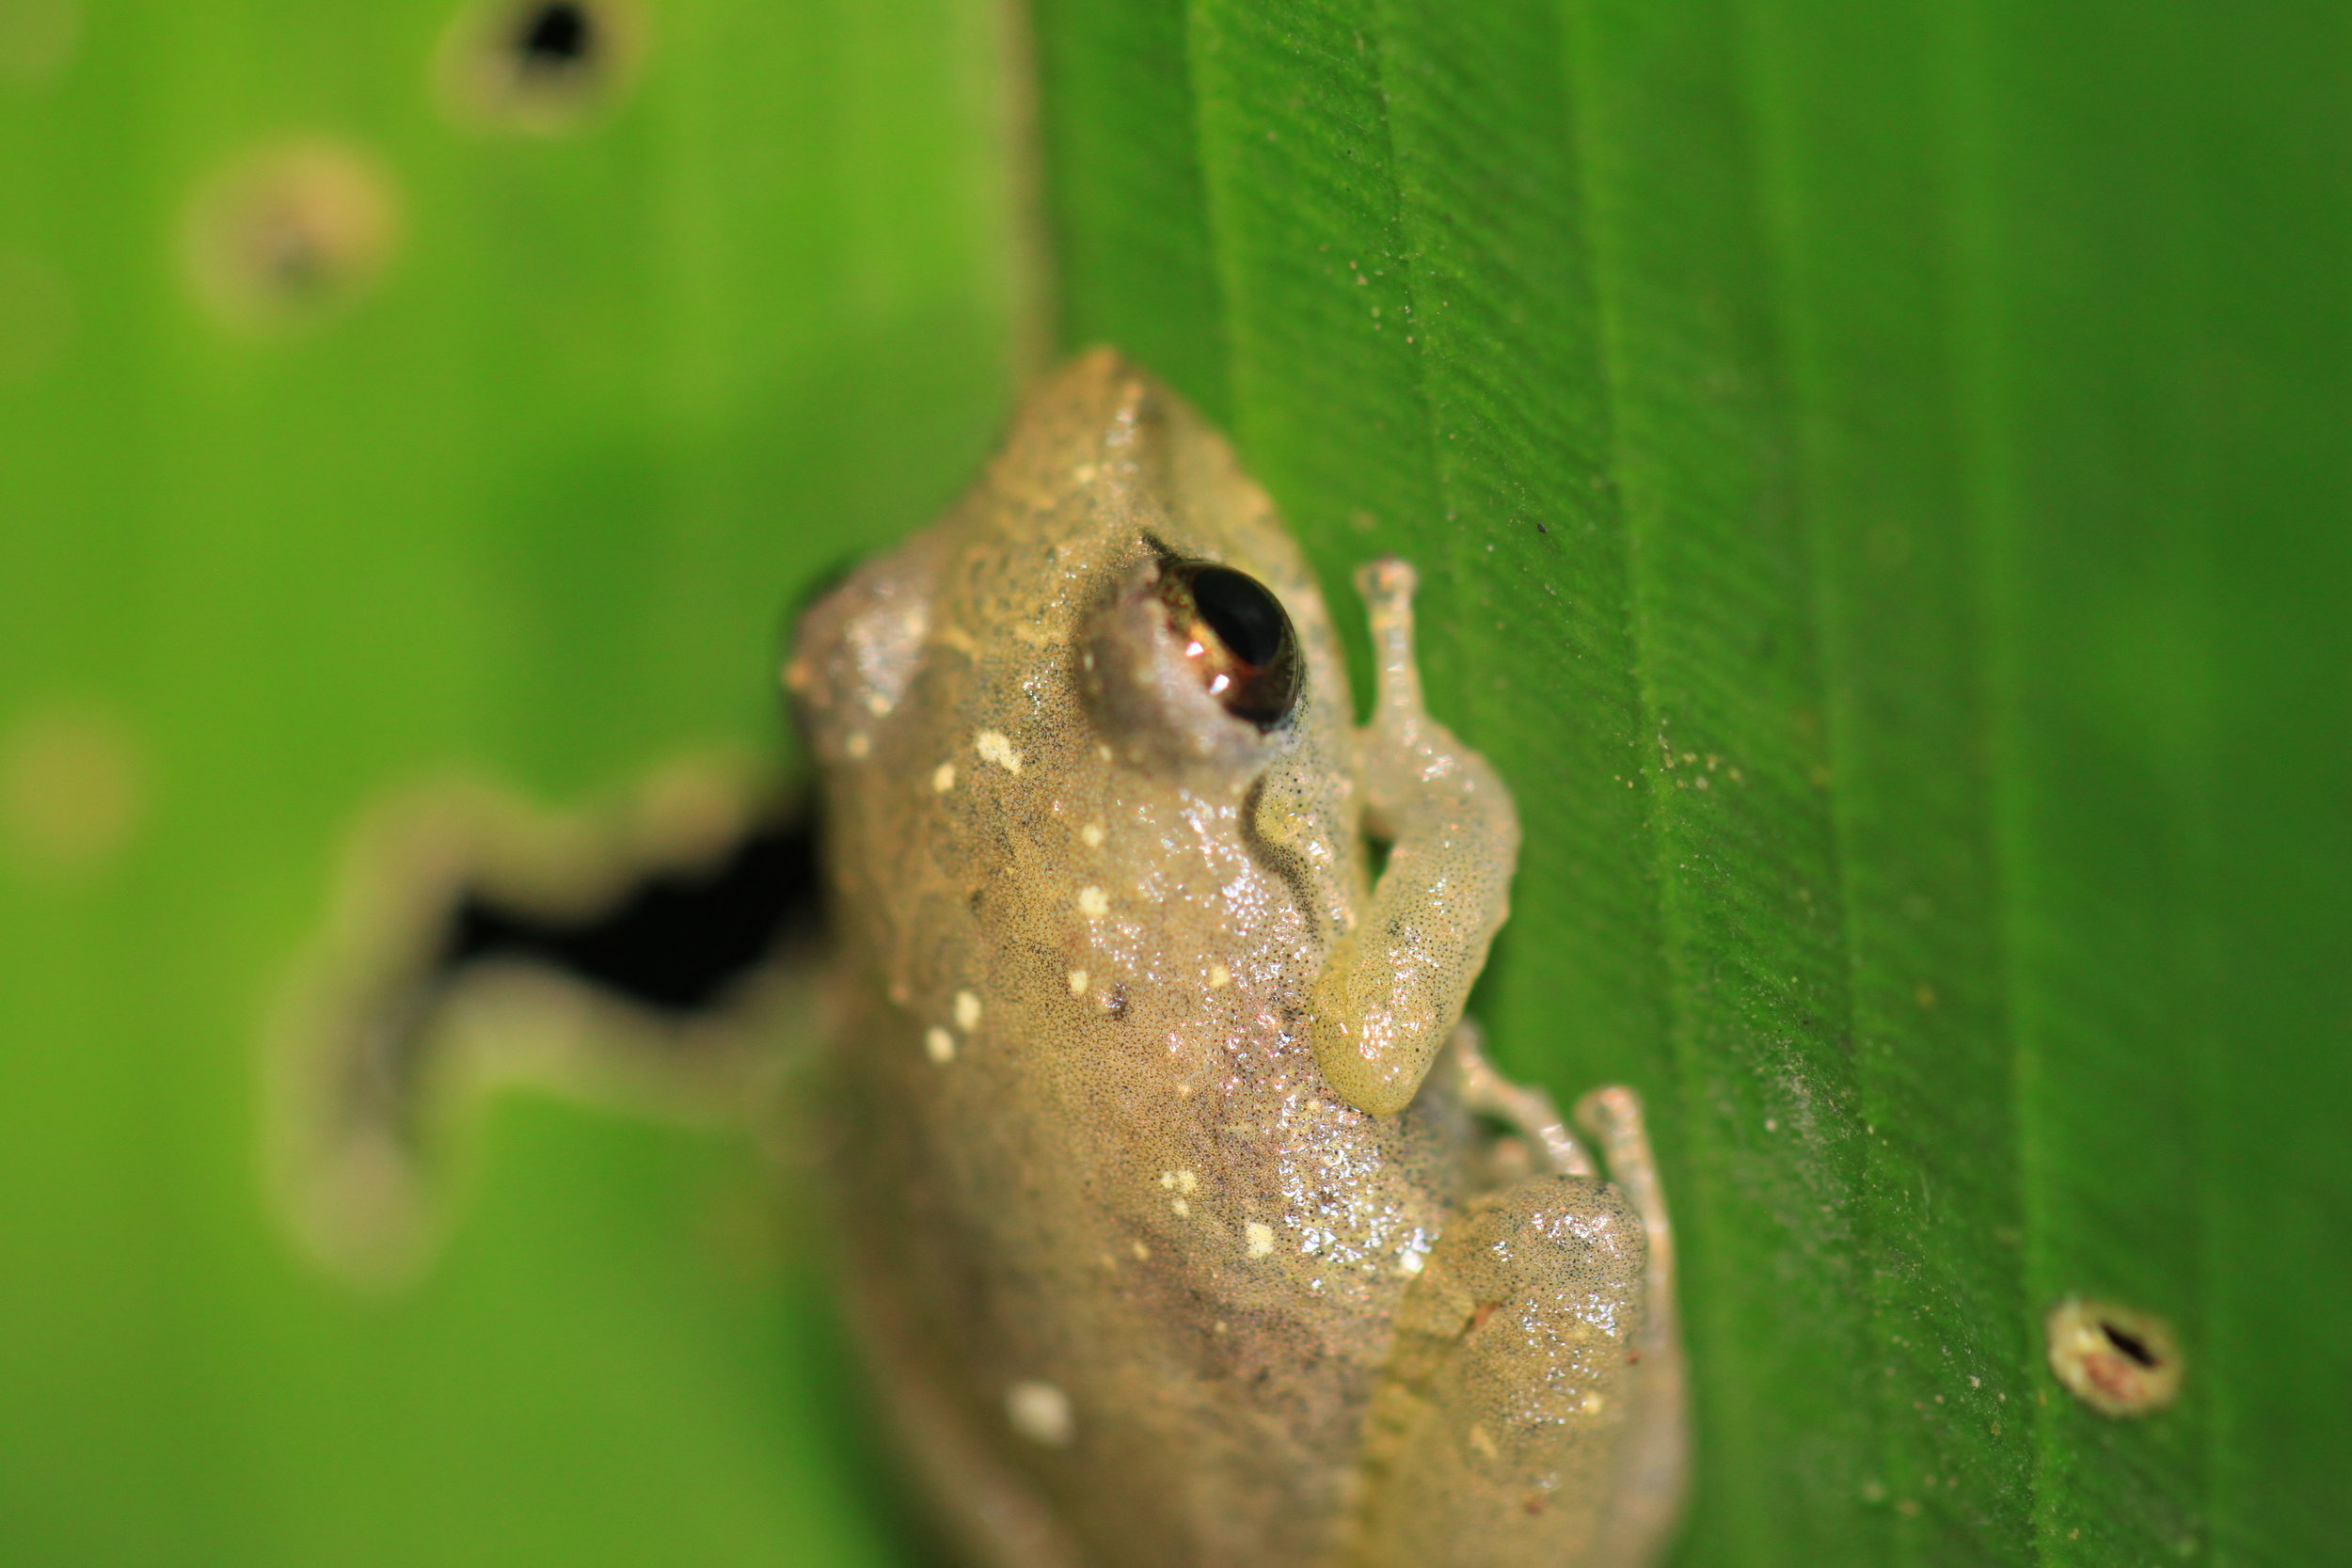 Olive tree frog ( Scinax elaeochrous )